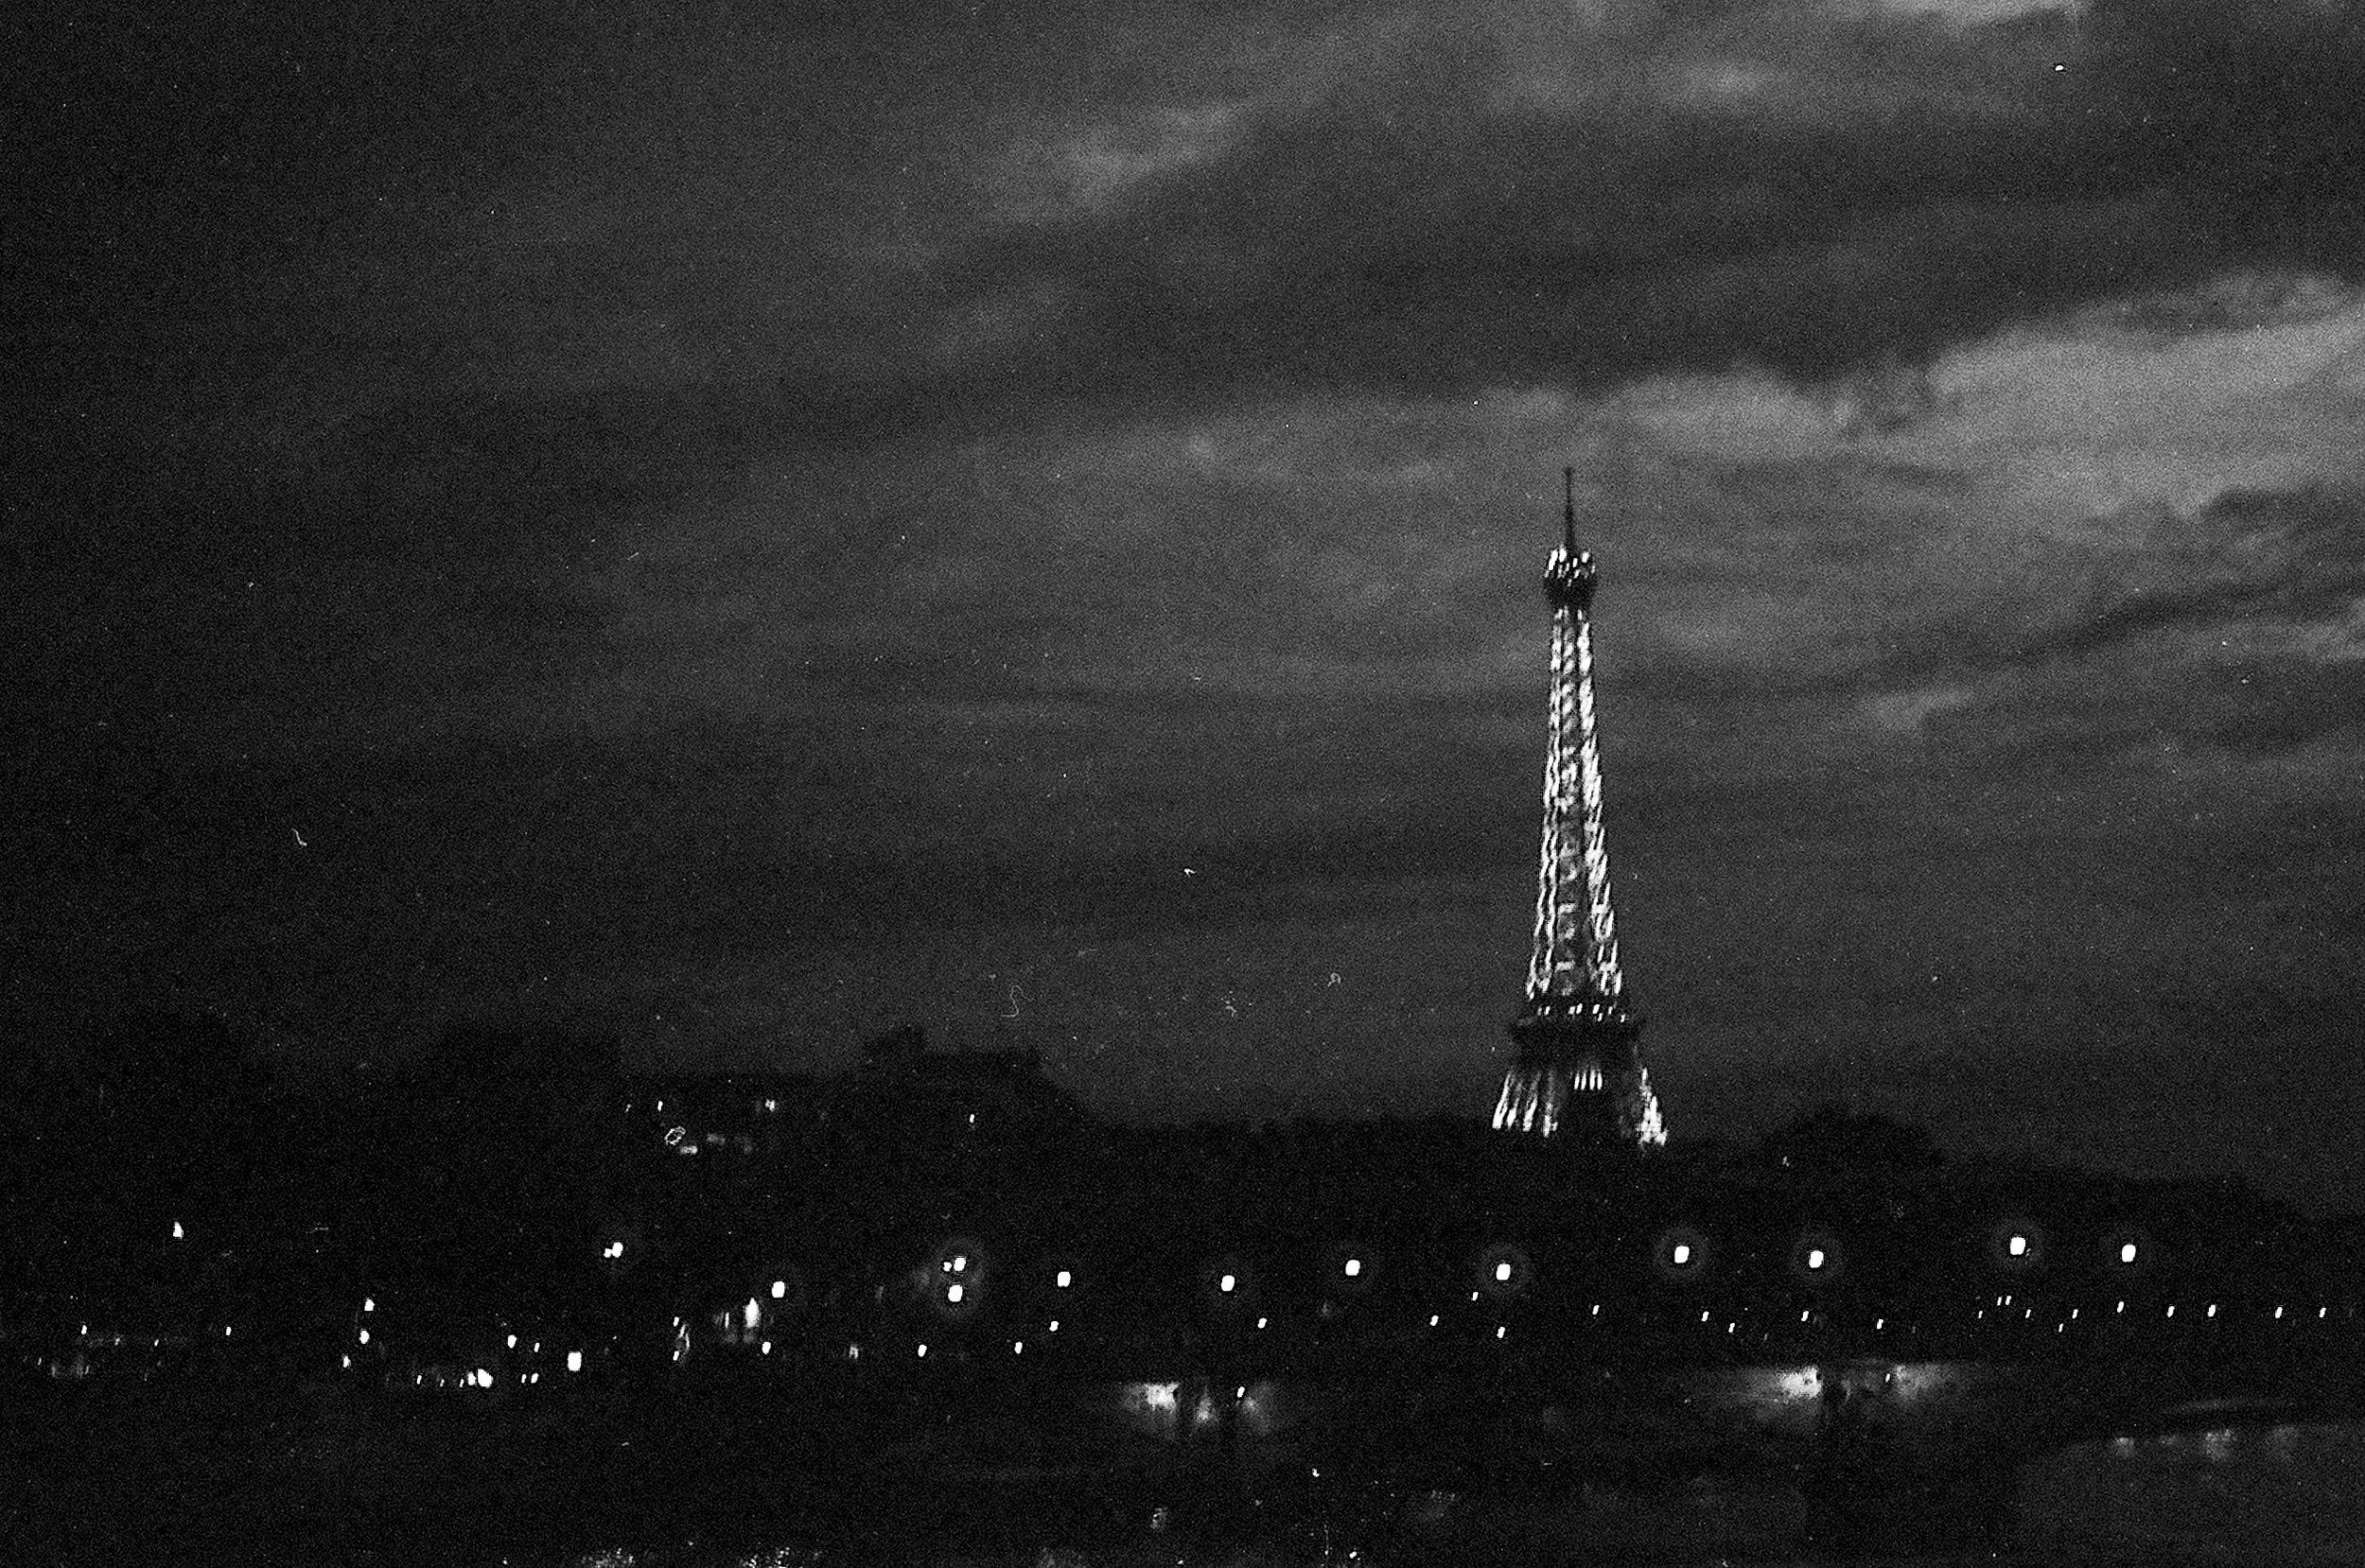 Paris B&W.jpg